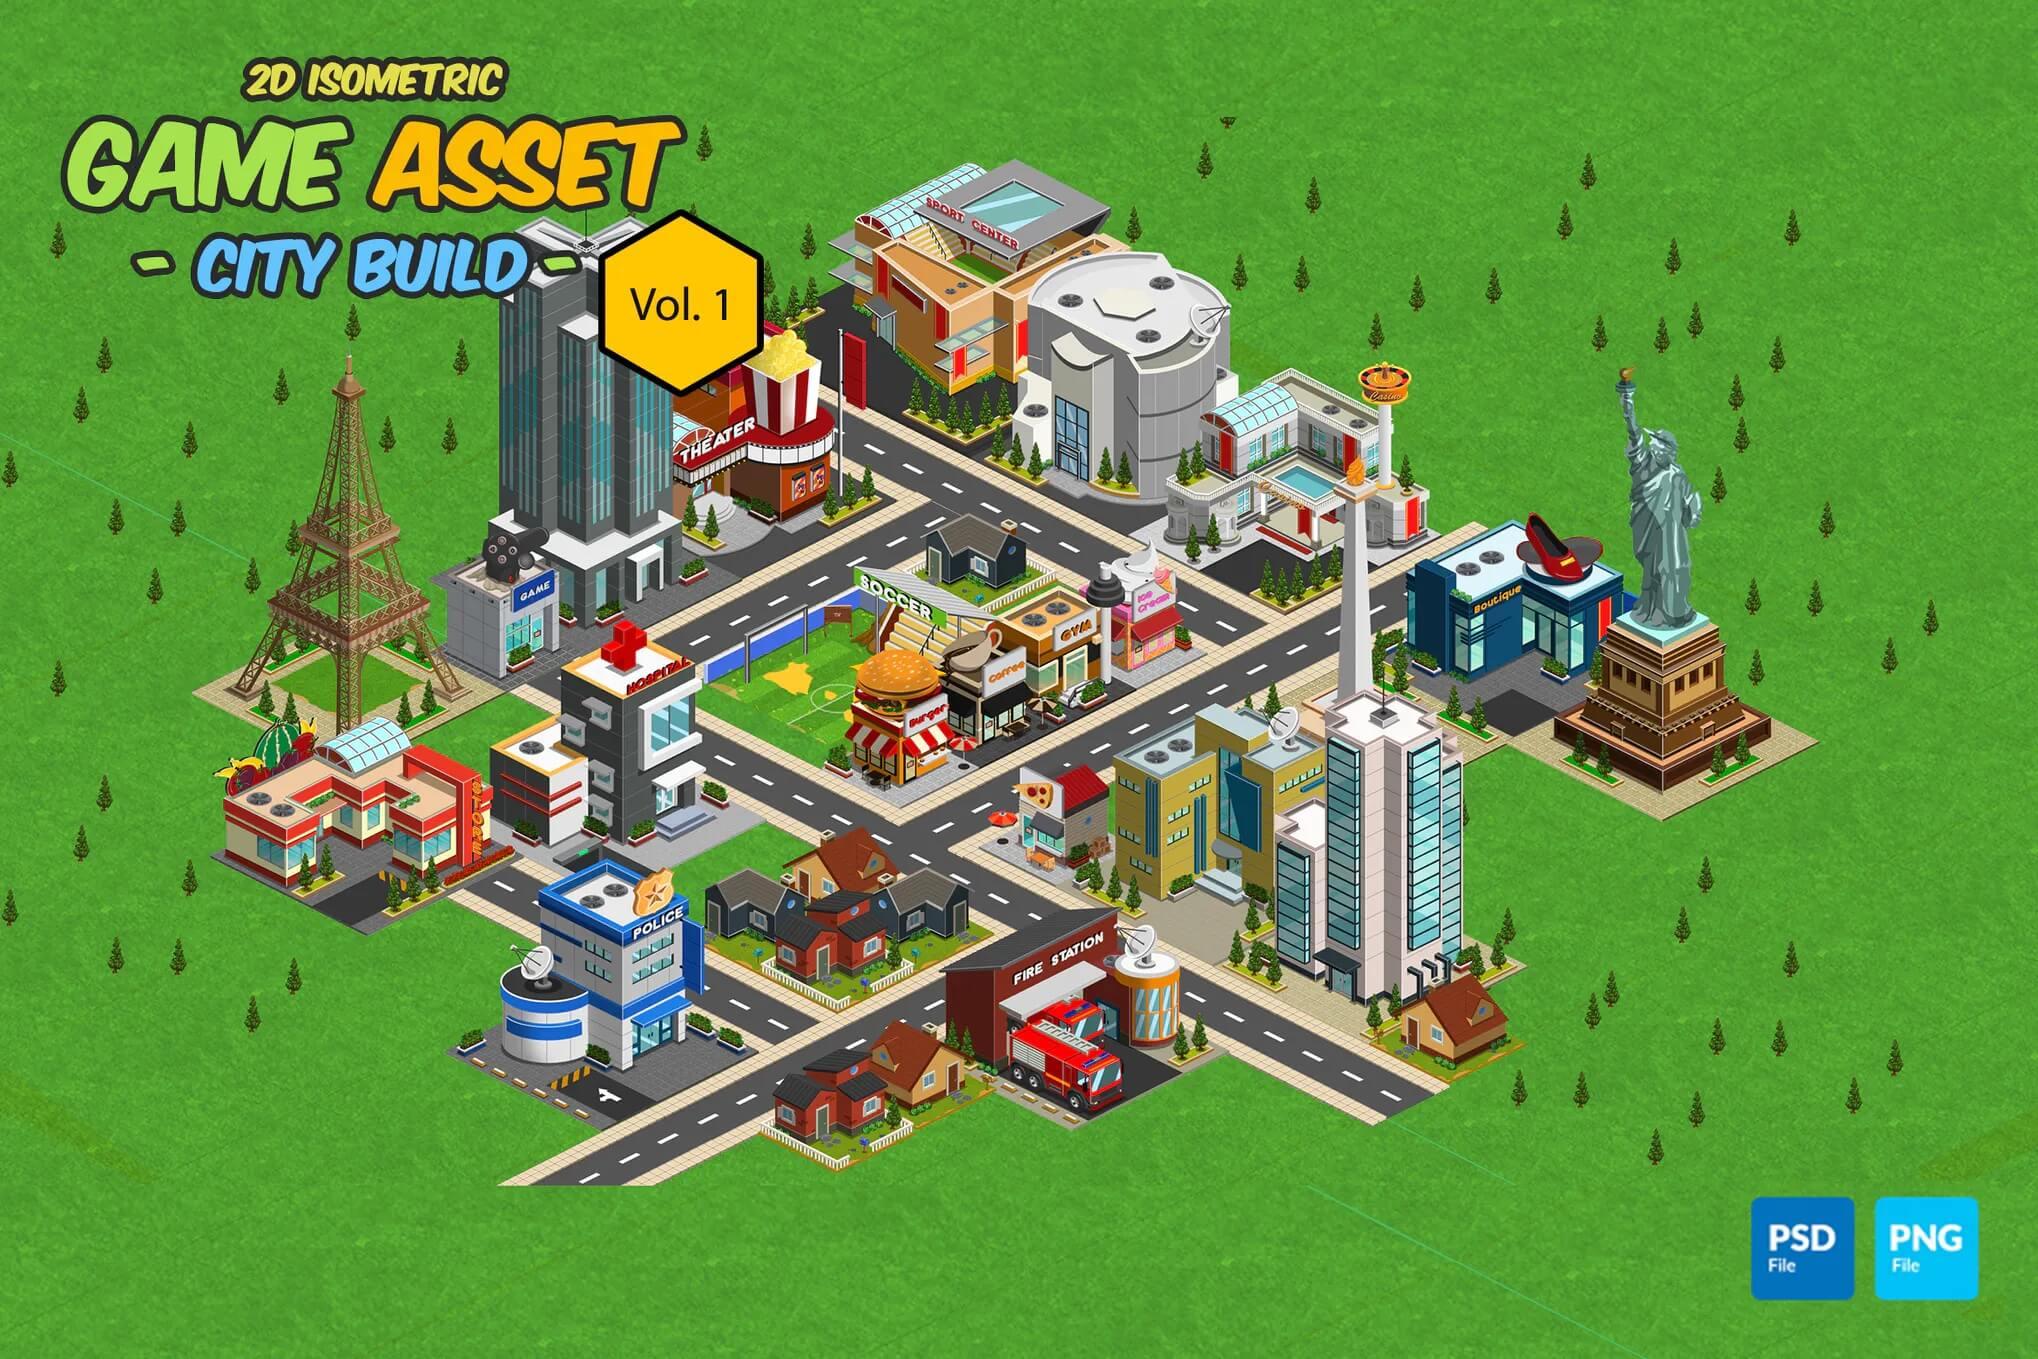 2D等距游戏资产-城市构建插图